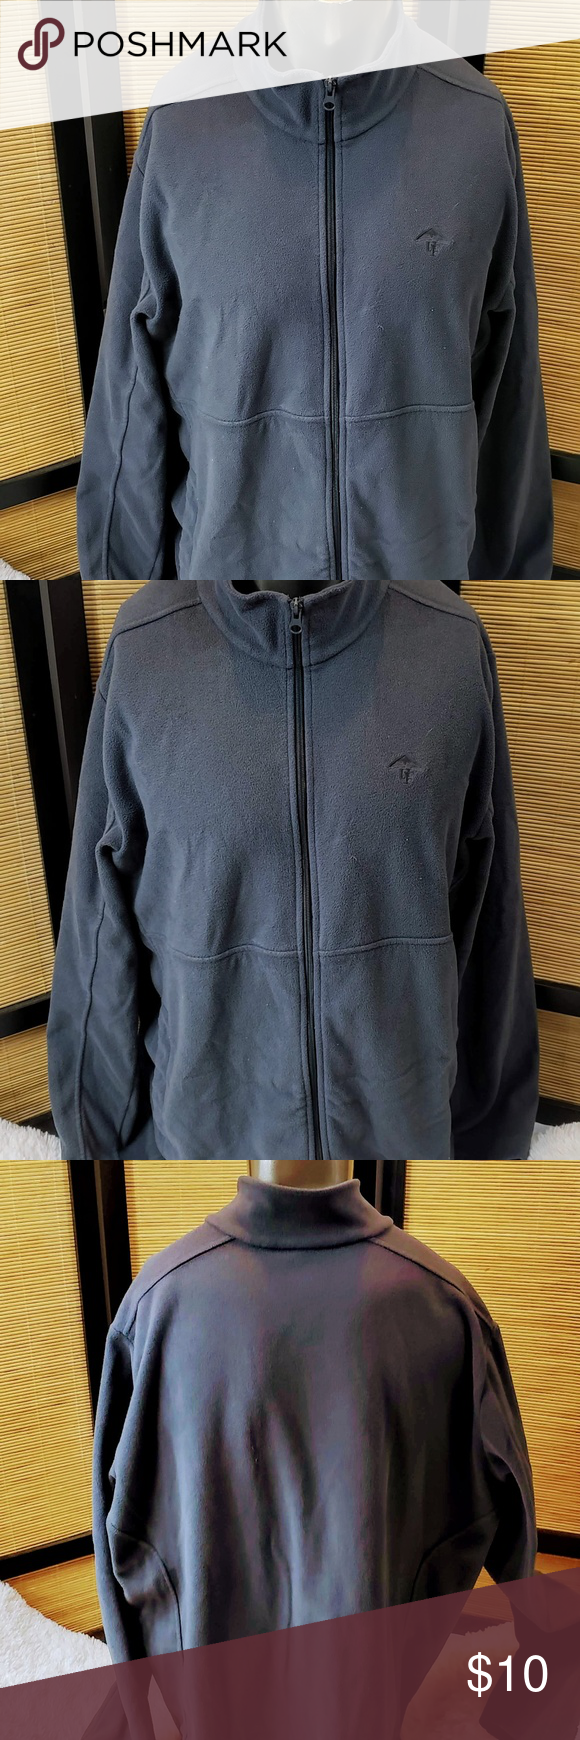 "d09e32a0 Urban Frontier Microfleece Sweatshirt Size XL Urban Frontier Microfleece  Sweatshirt Size XL Full Zip Front Pockets 100% Polyester Length: 27"" Sleeve:  26.5"" ..."